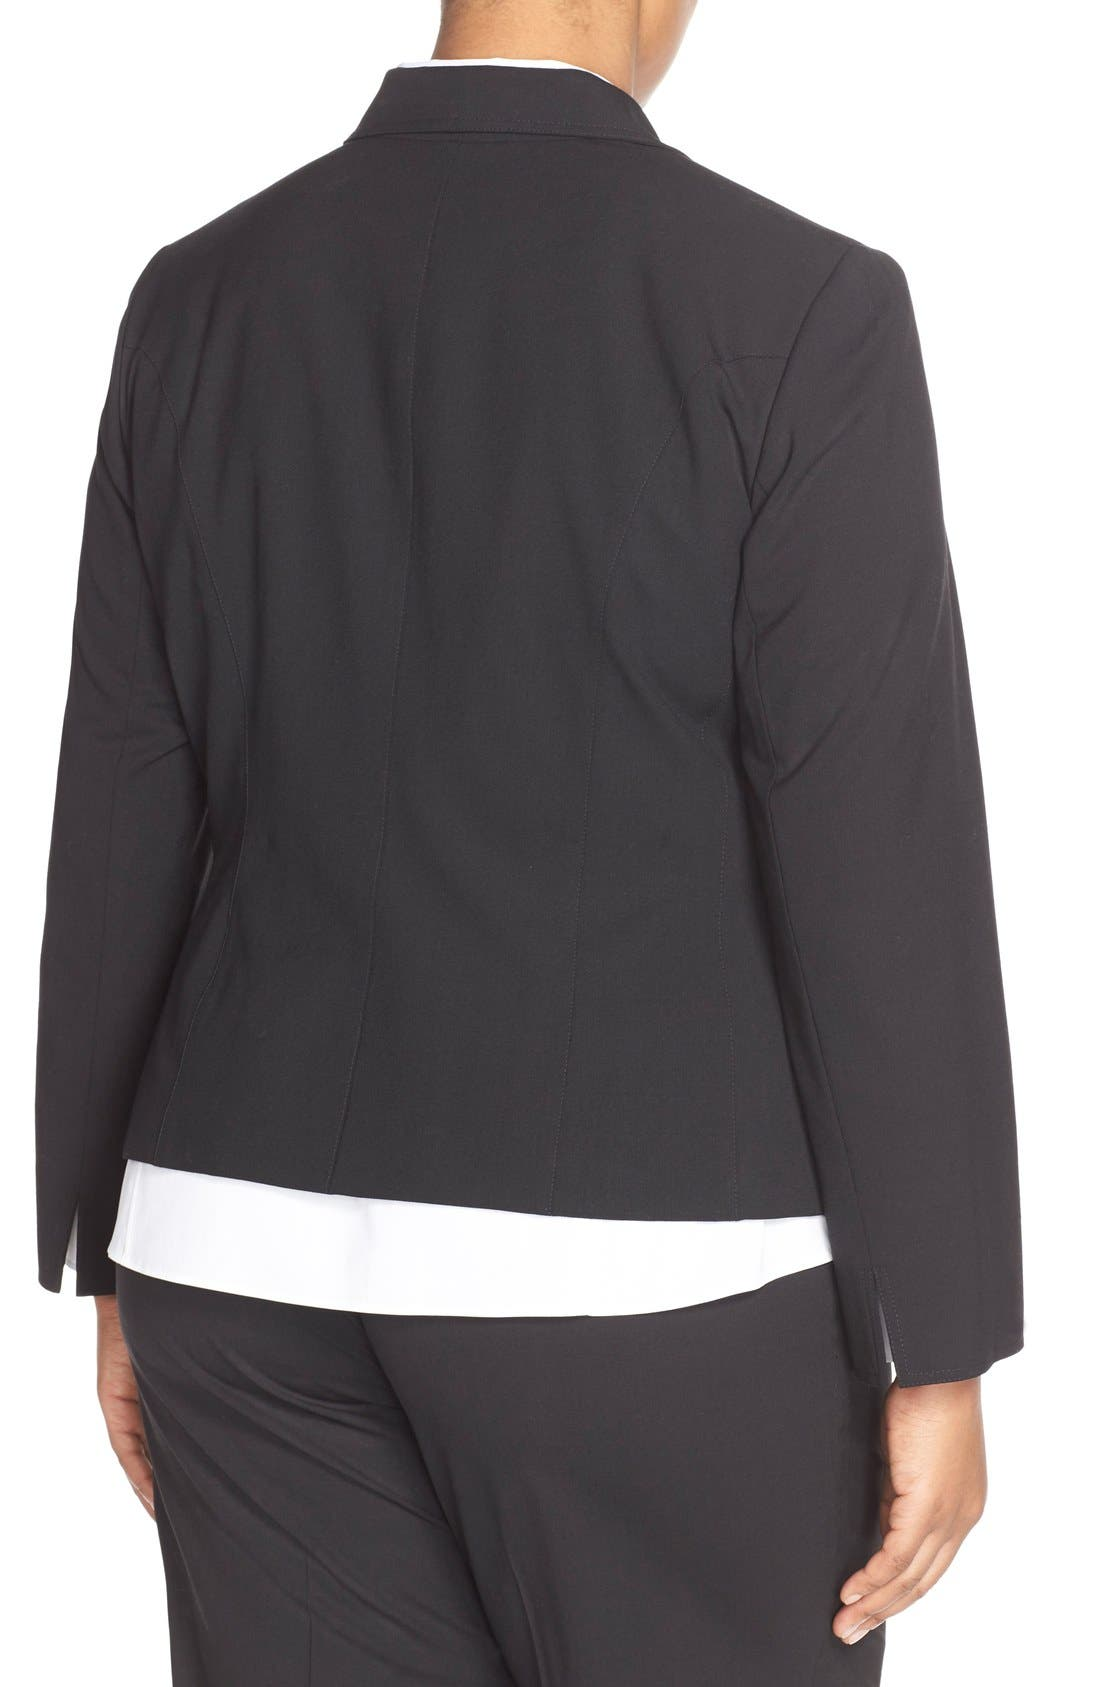 'Gladstone' Stretch Wool Jacket,                             Alternate thumbnail 2, color,                             Black